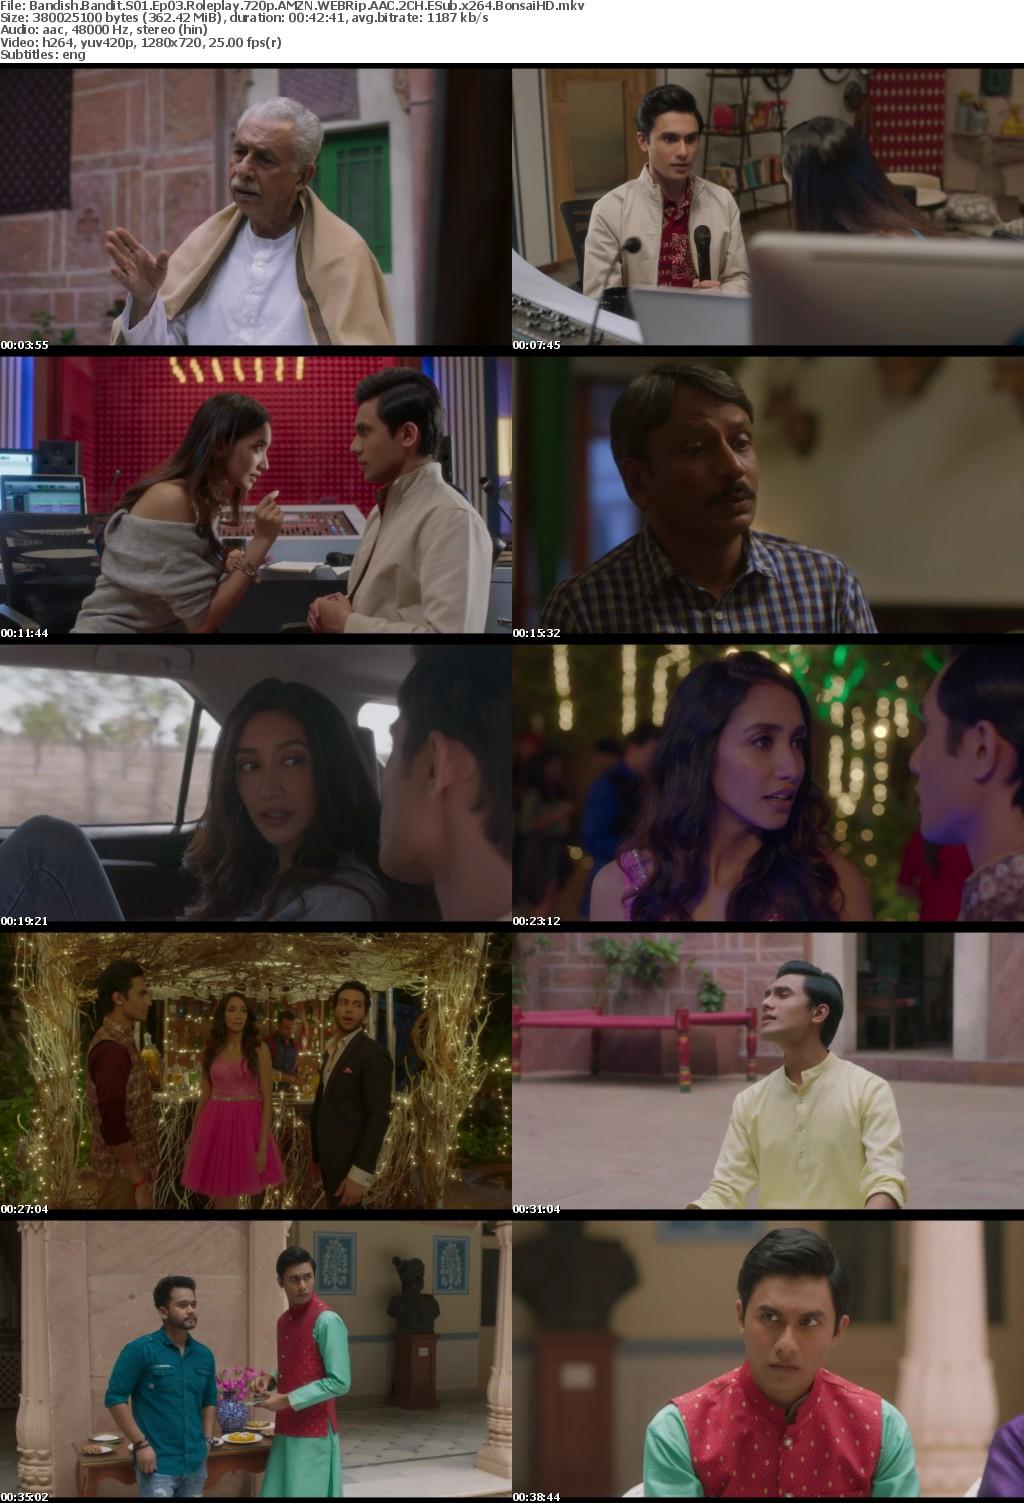 Bandish Bandits (2020) Hindi S01 Complete 720p AMZN WEBRip 3 2 GB AAC 2CH x264 - Shadow (BonsaiHD)